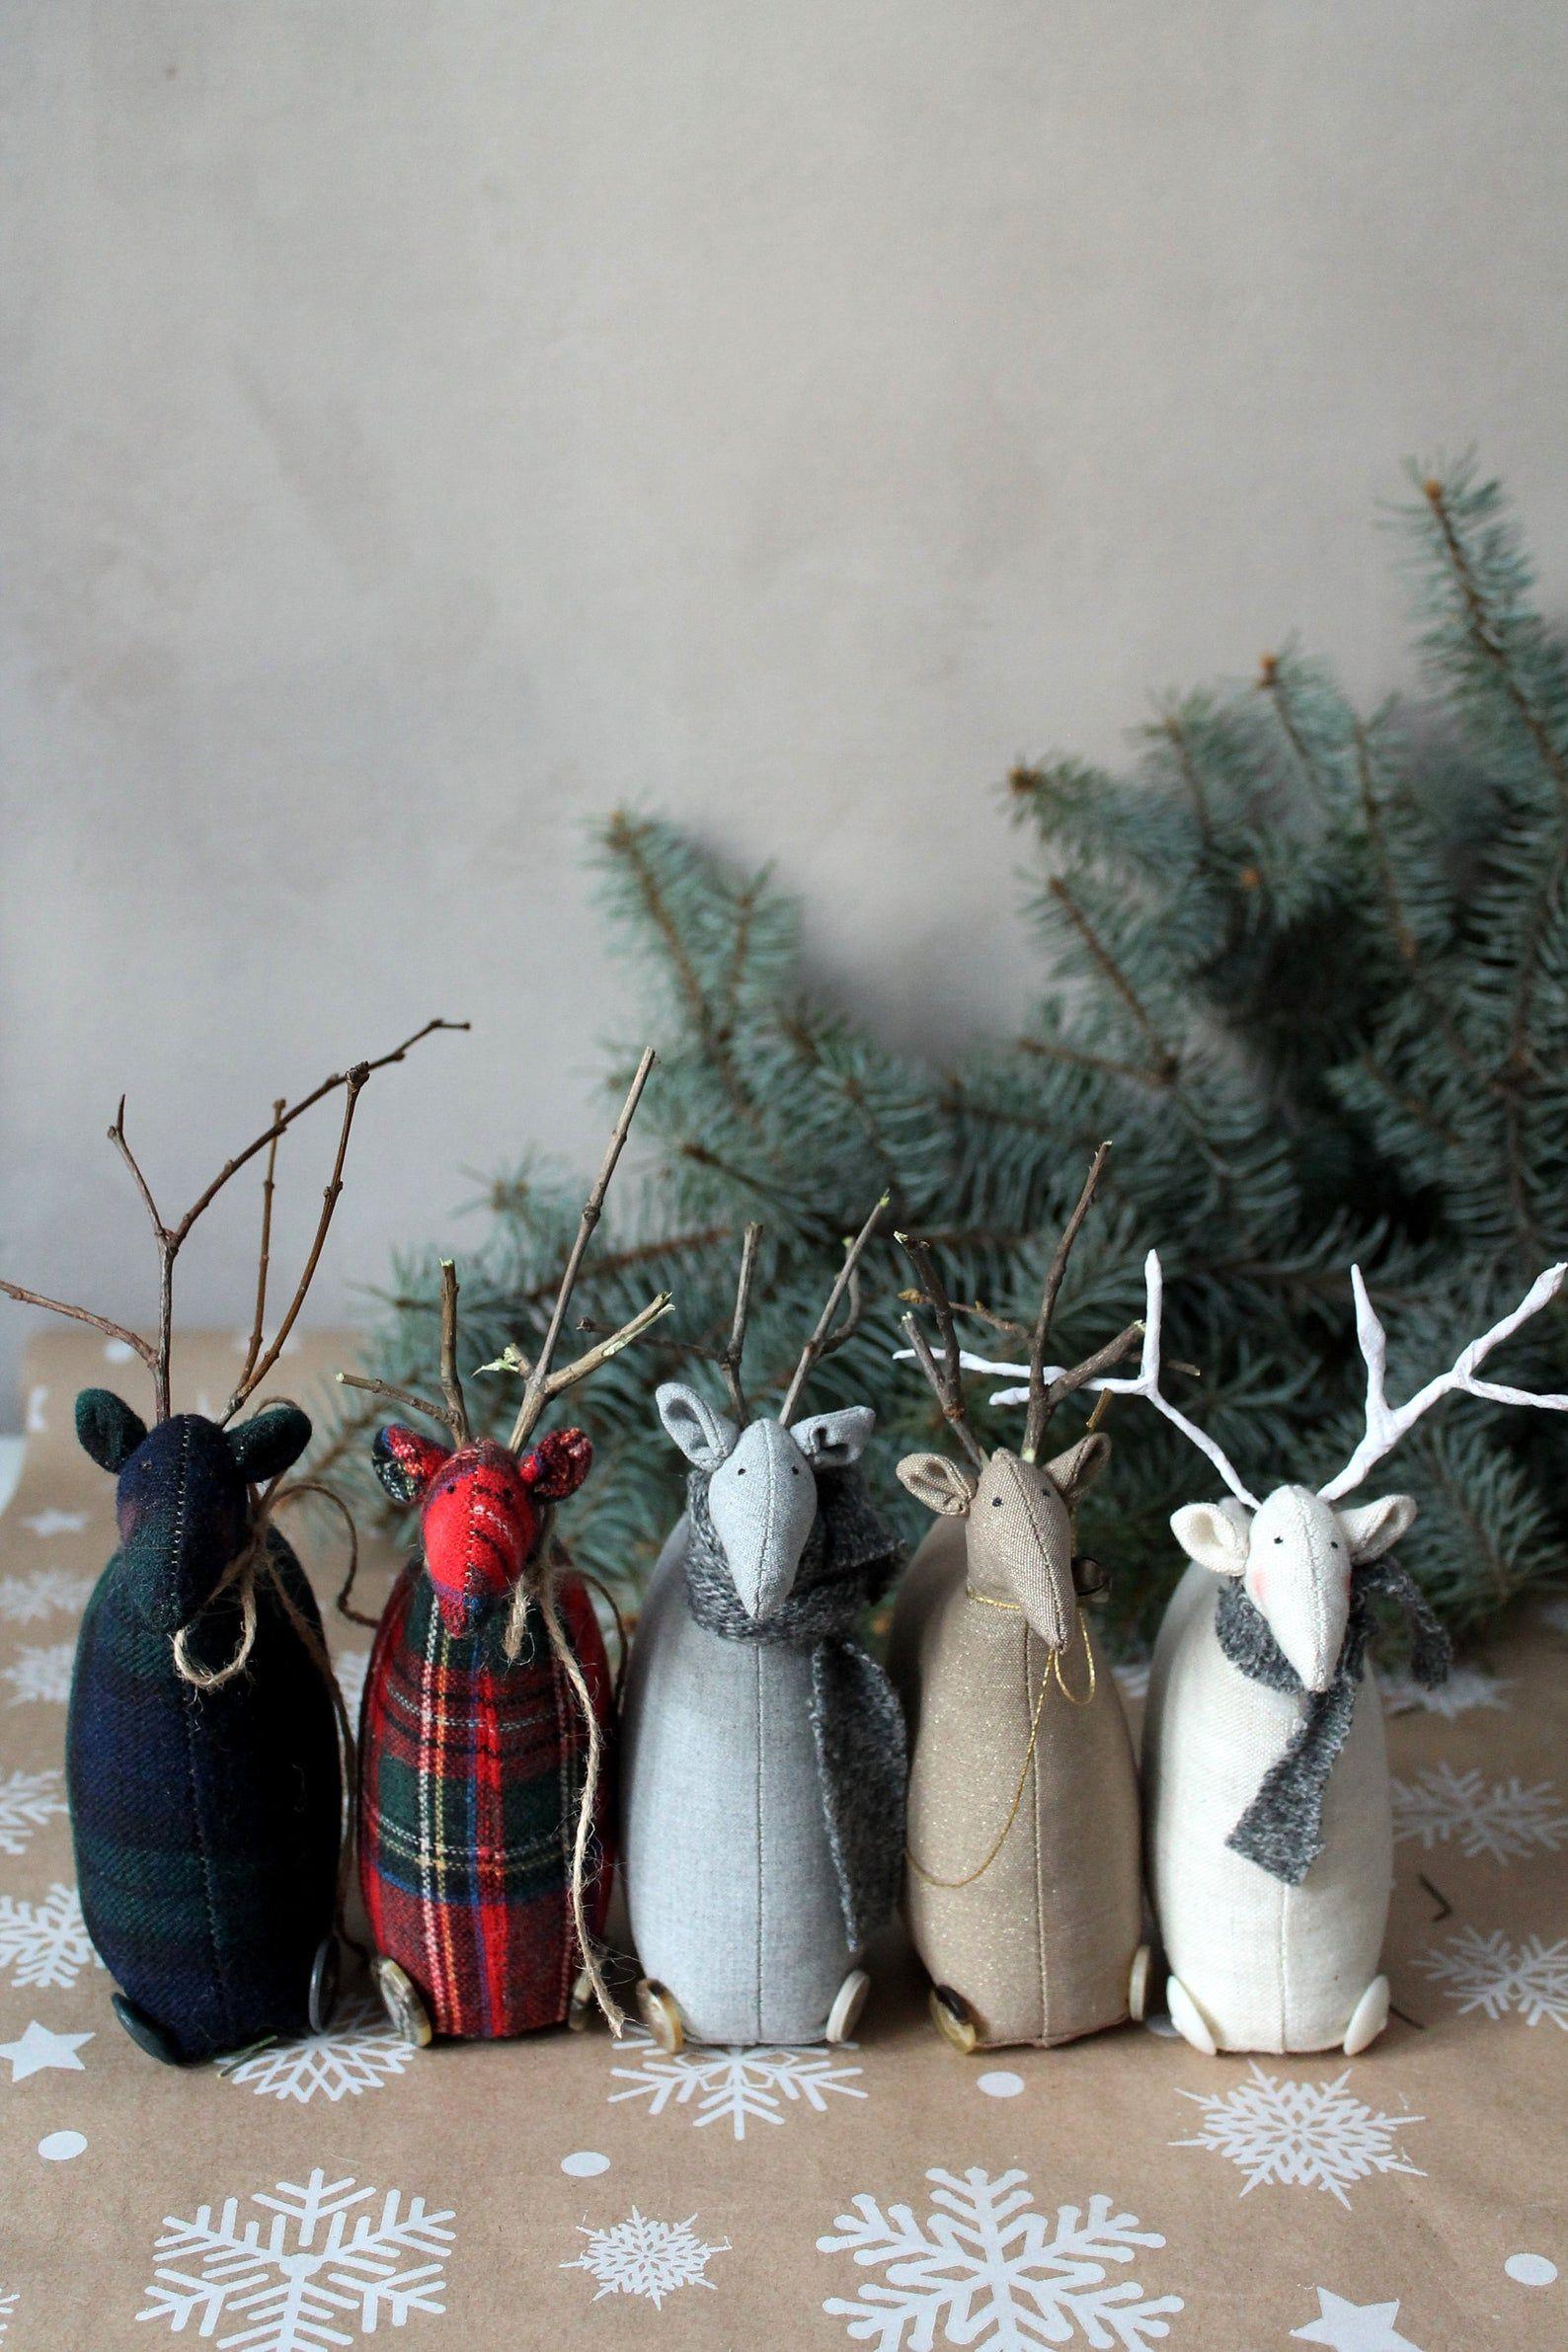 Nordic Animal Christmas Tree Ornaments Set Of 6 Crate And Barrel In 2020 Animal Ornament Christmas Ornament Sets Christmas Ornaments